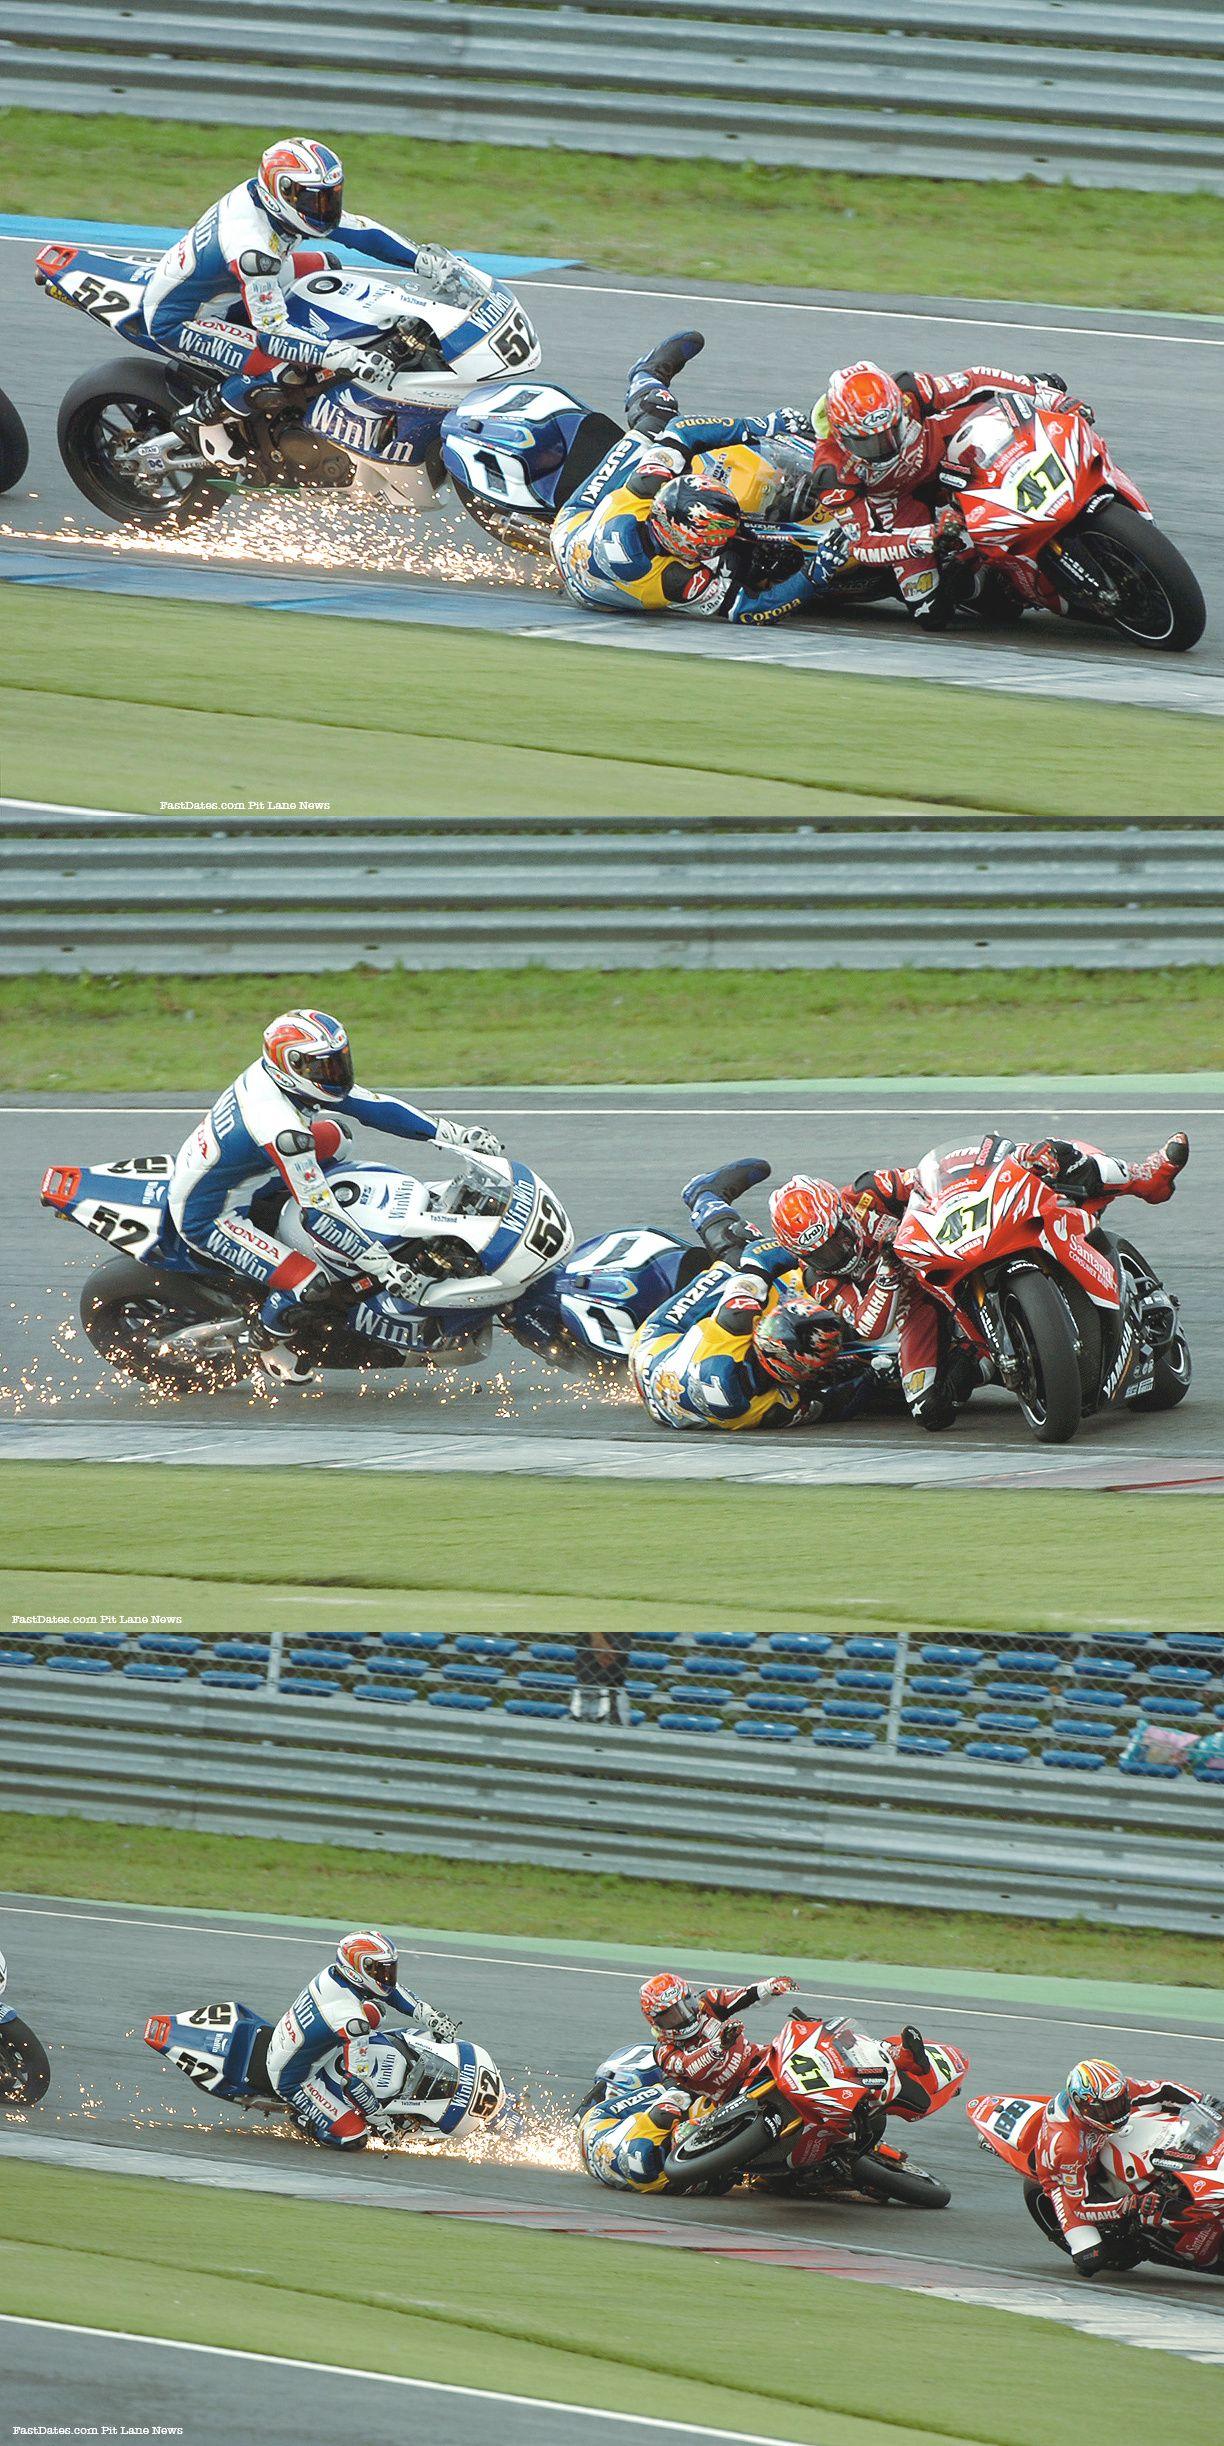 Assen 2006 Race 2 Haga Corser Toseland crash [credits